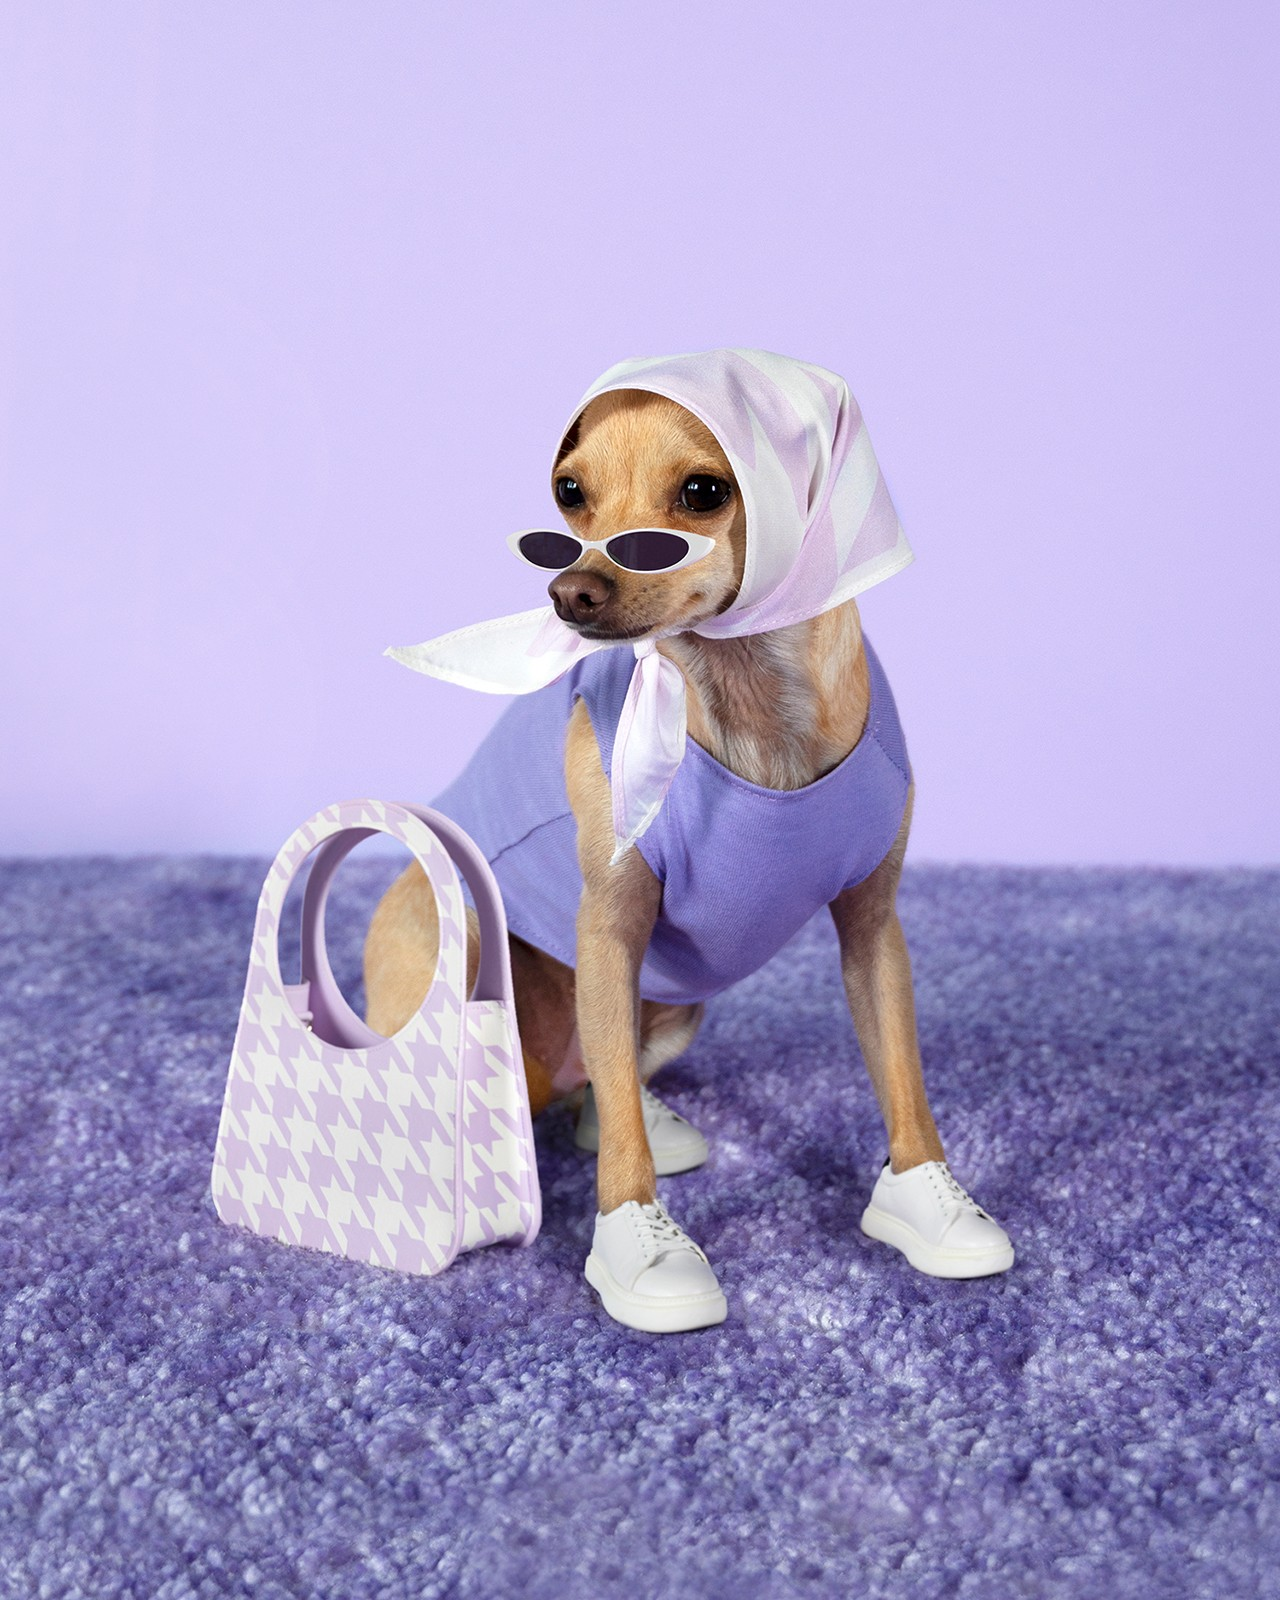 Boobie Billie Instagram Dog Fashion Influencer Style Chihuahua Sneakers Sunglasses Headscarf Cow Print Bag